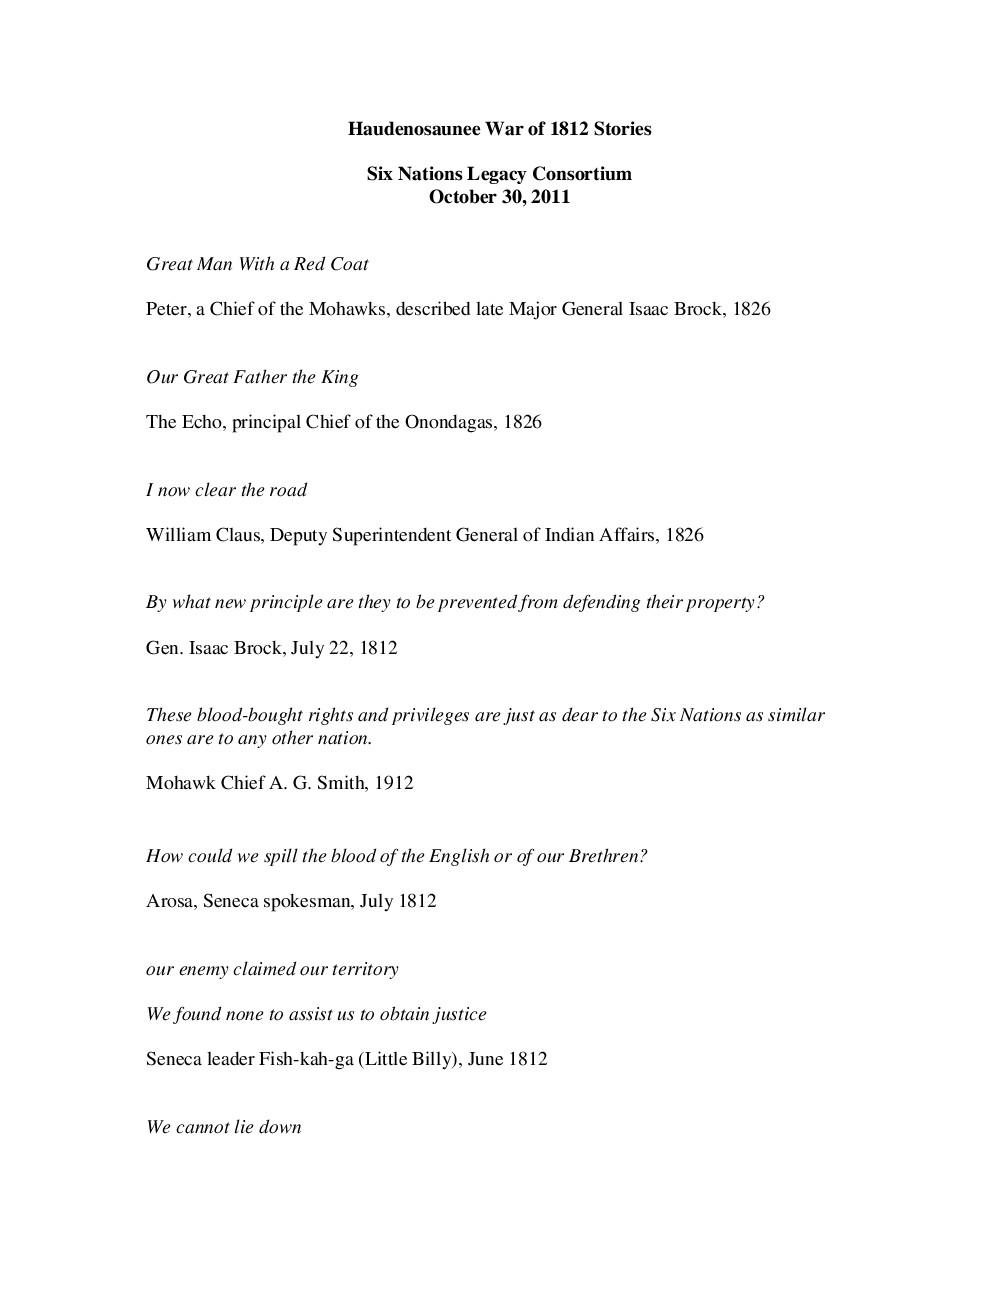 War of 1812 Series : 2012 Haudenosaunee War of 1812 Stories